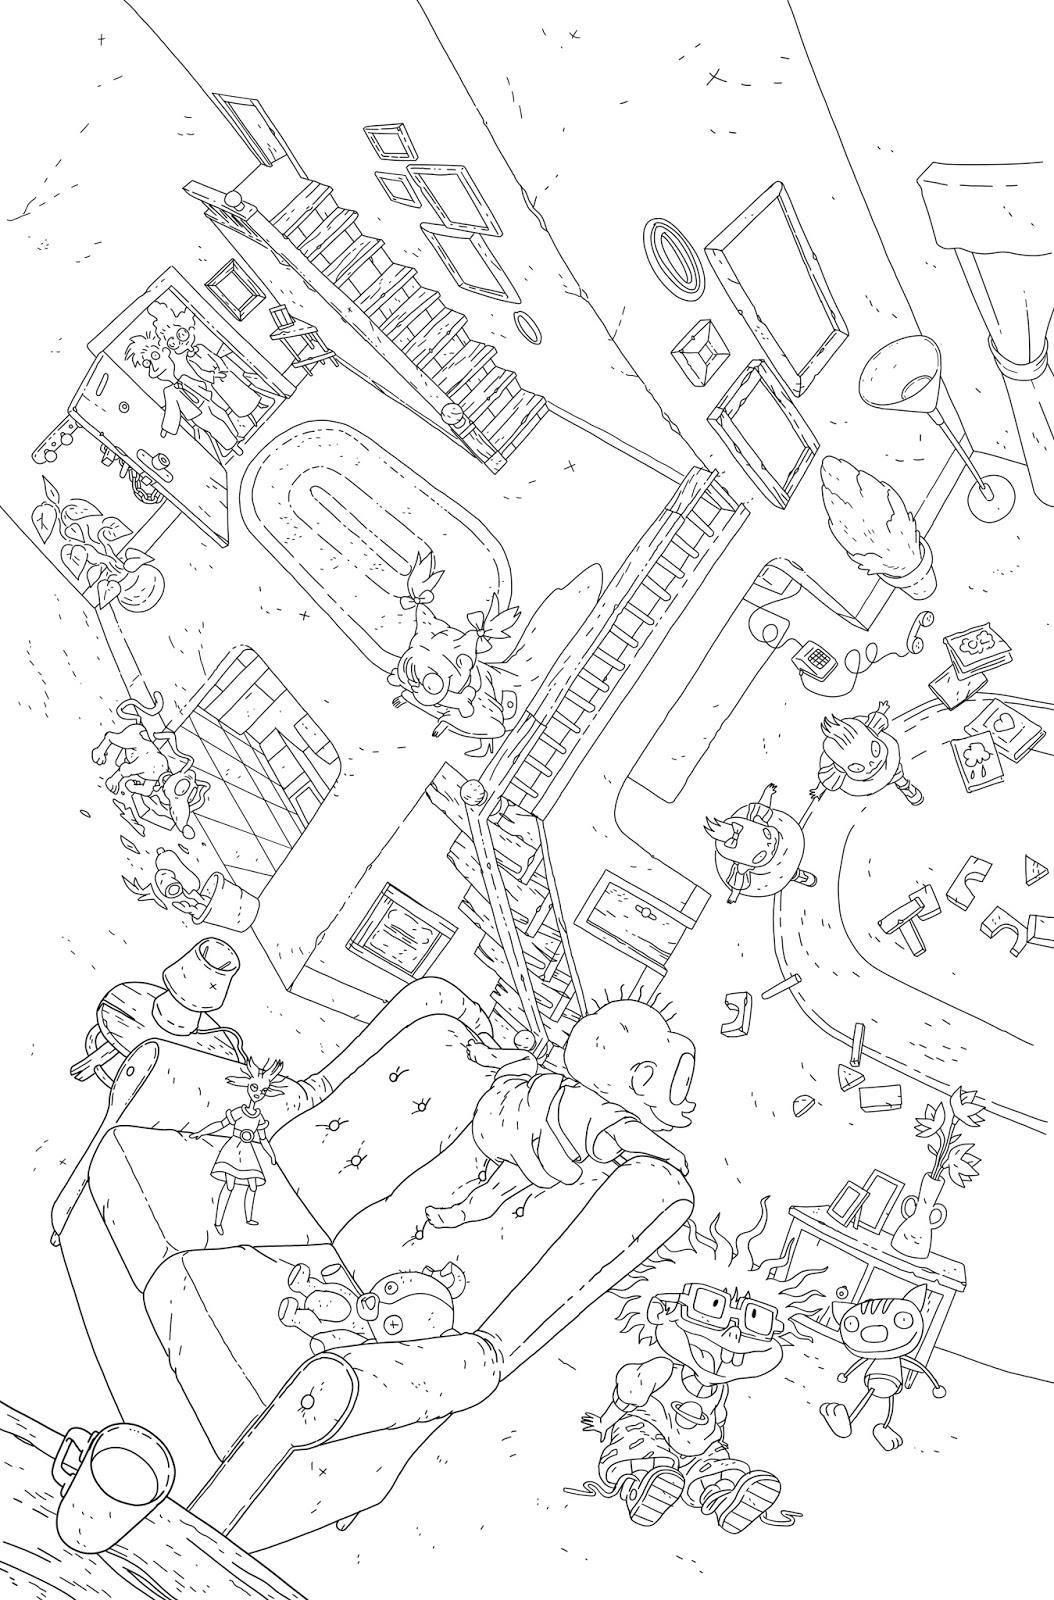 NickALive!: First-Look At BOOM! Studios' Upcoming 'Rugrats